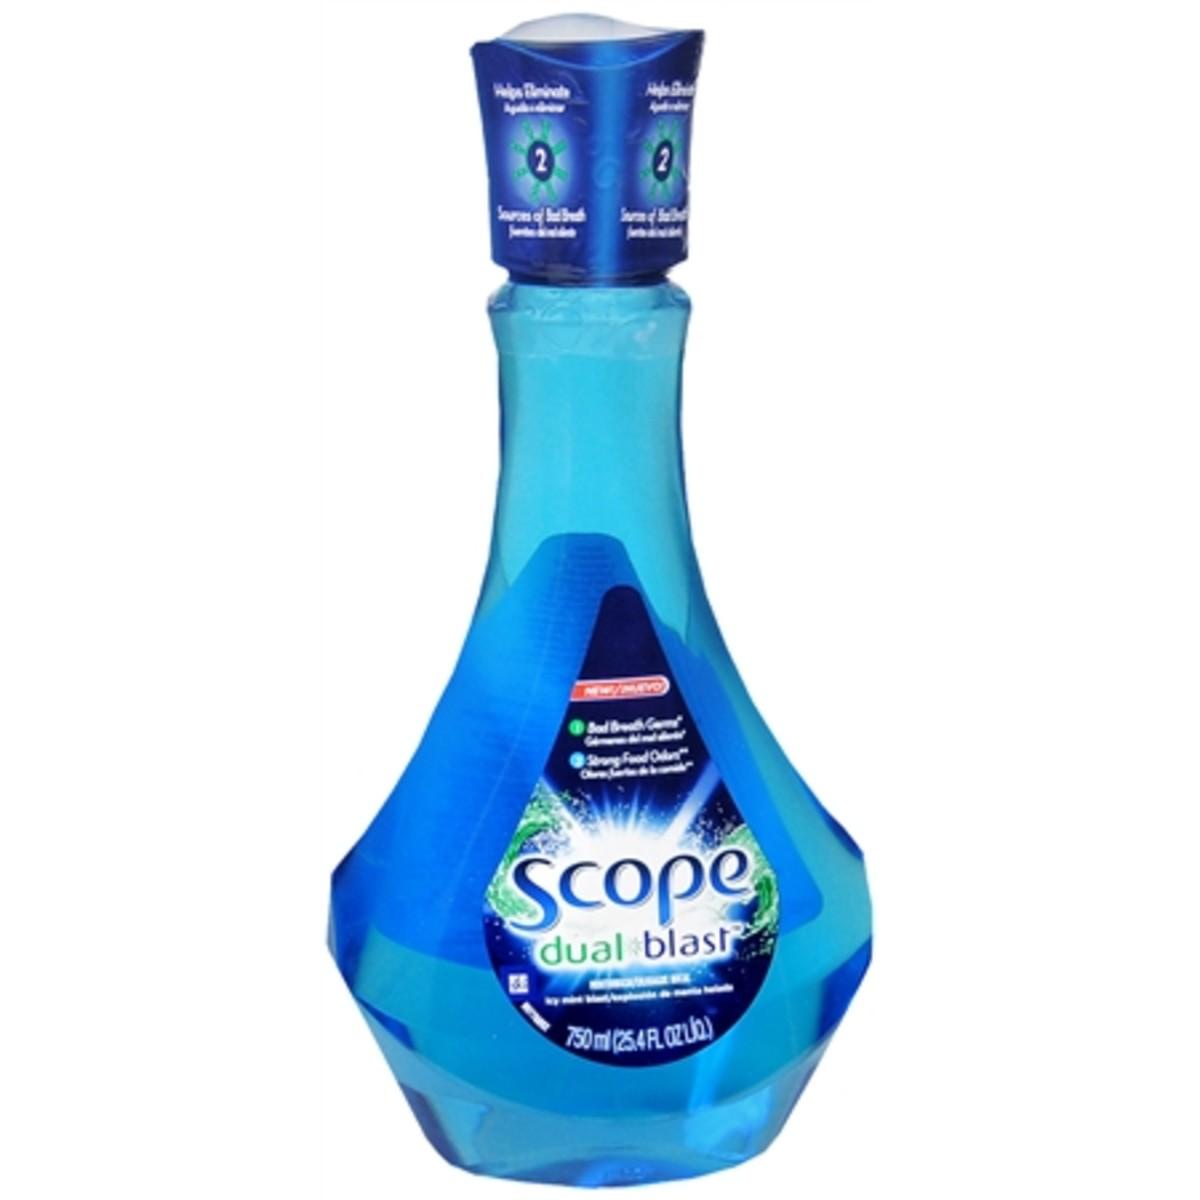 Scope-Dual-Blast-Mouthwash